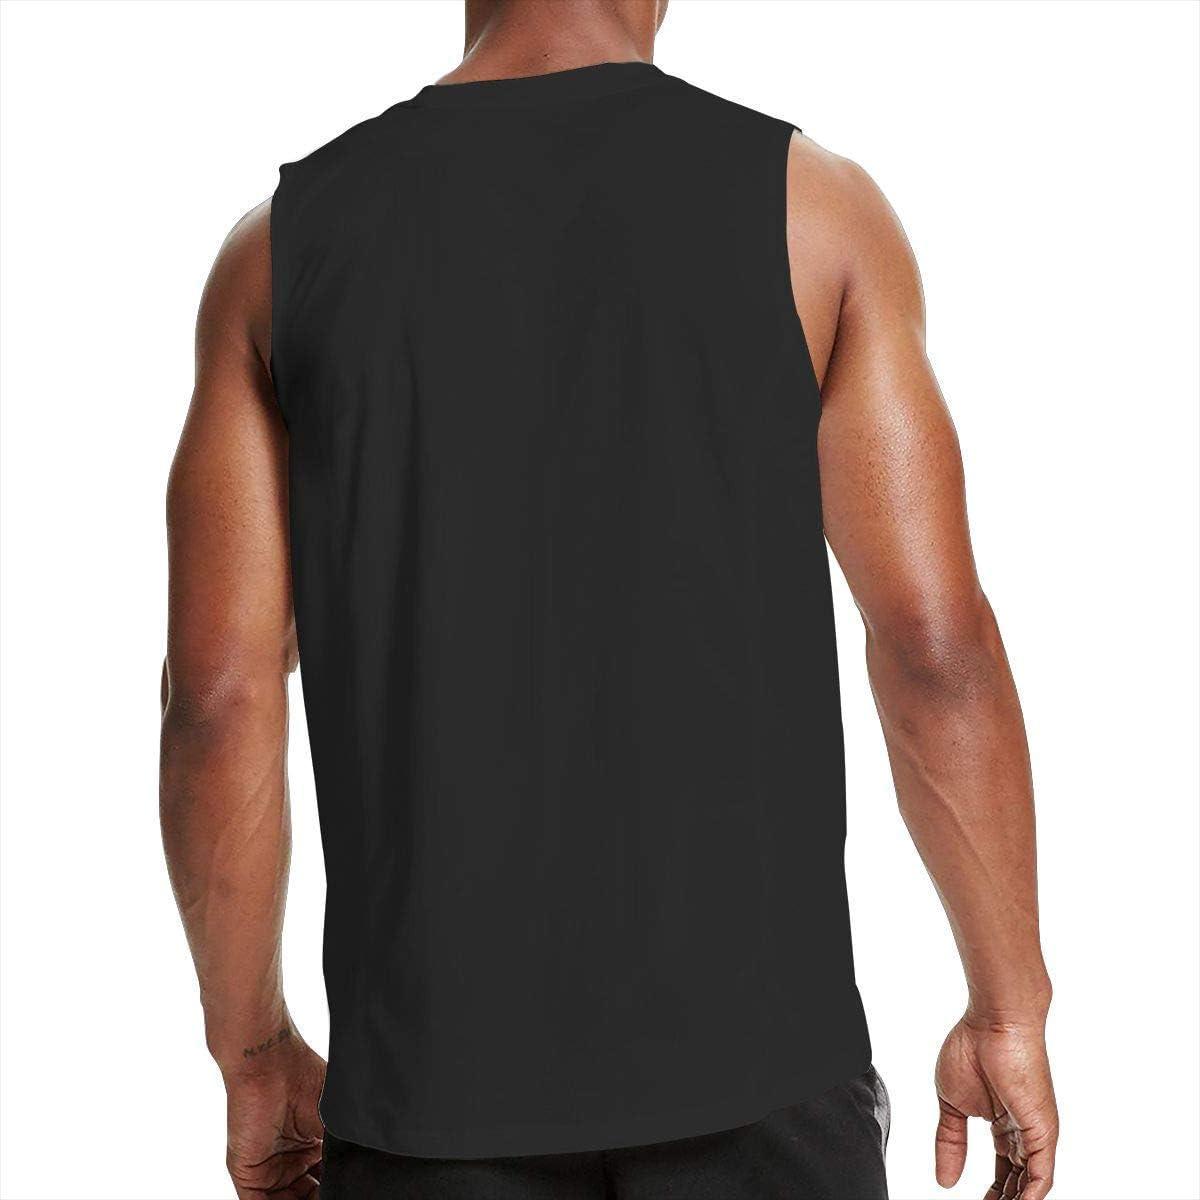 THWTHGTR Halestorm Camiseta Hombre sin Mangas Ultra Cotton Muscle Fashion Tees Tank Top